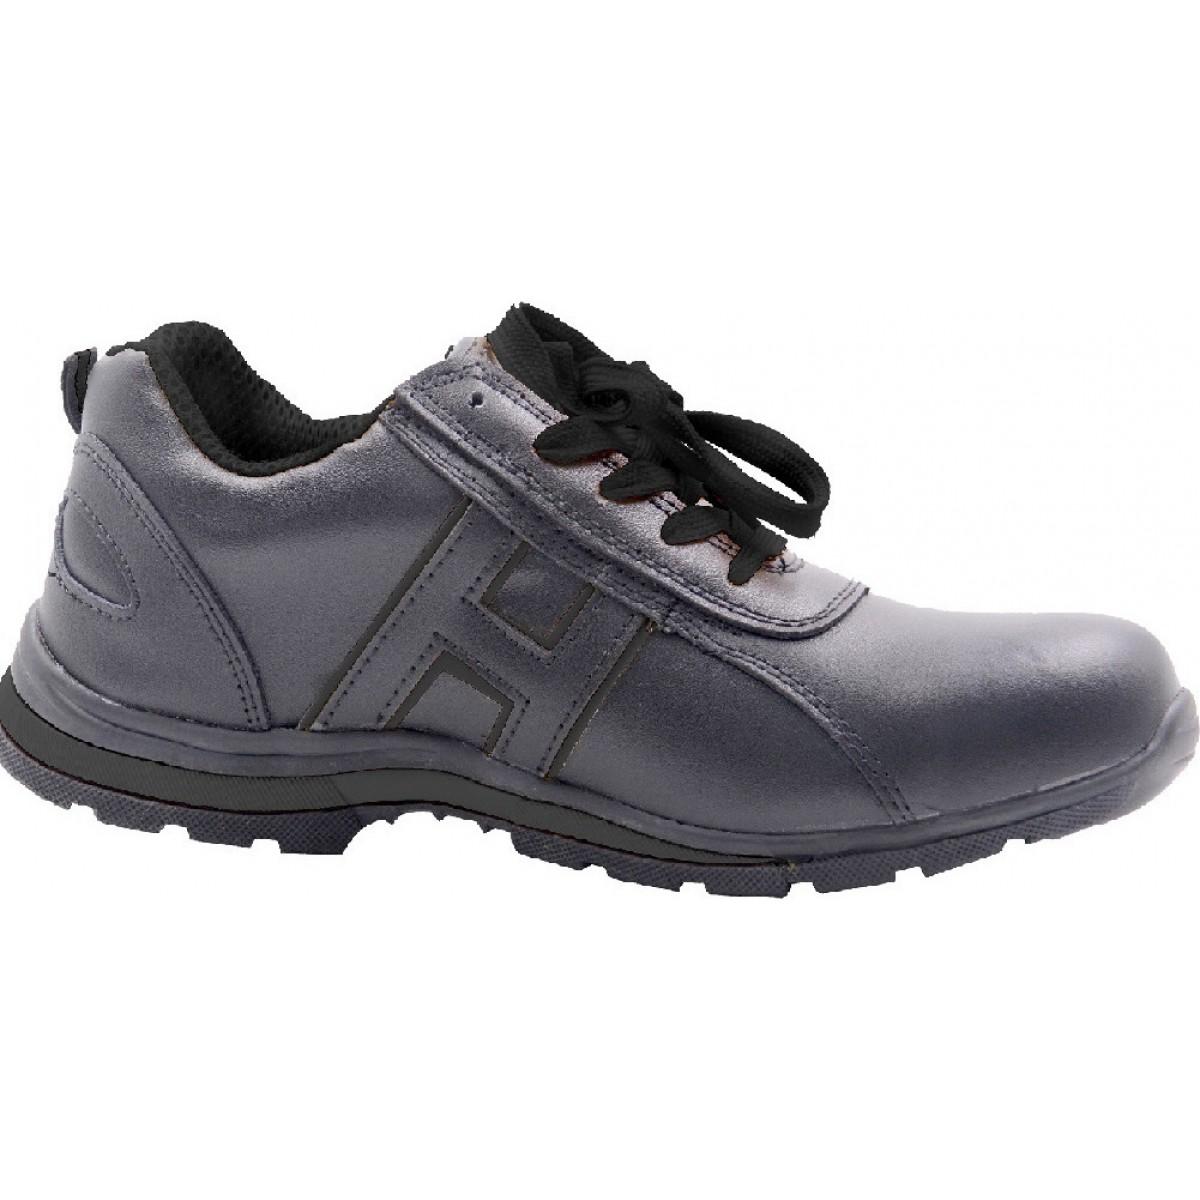 BORMANN ATLAS Αθλητικά παπούτσια δερμάτινα χωρίς προστασία